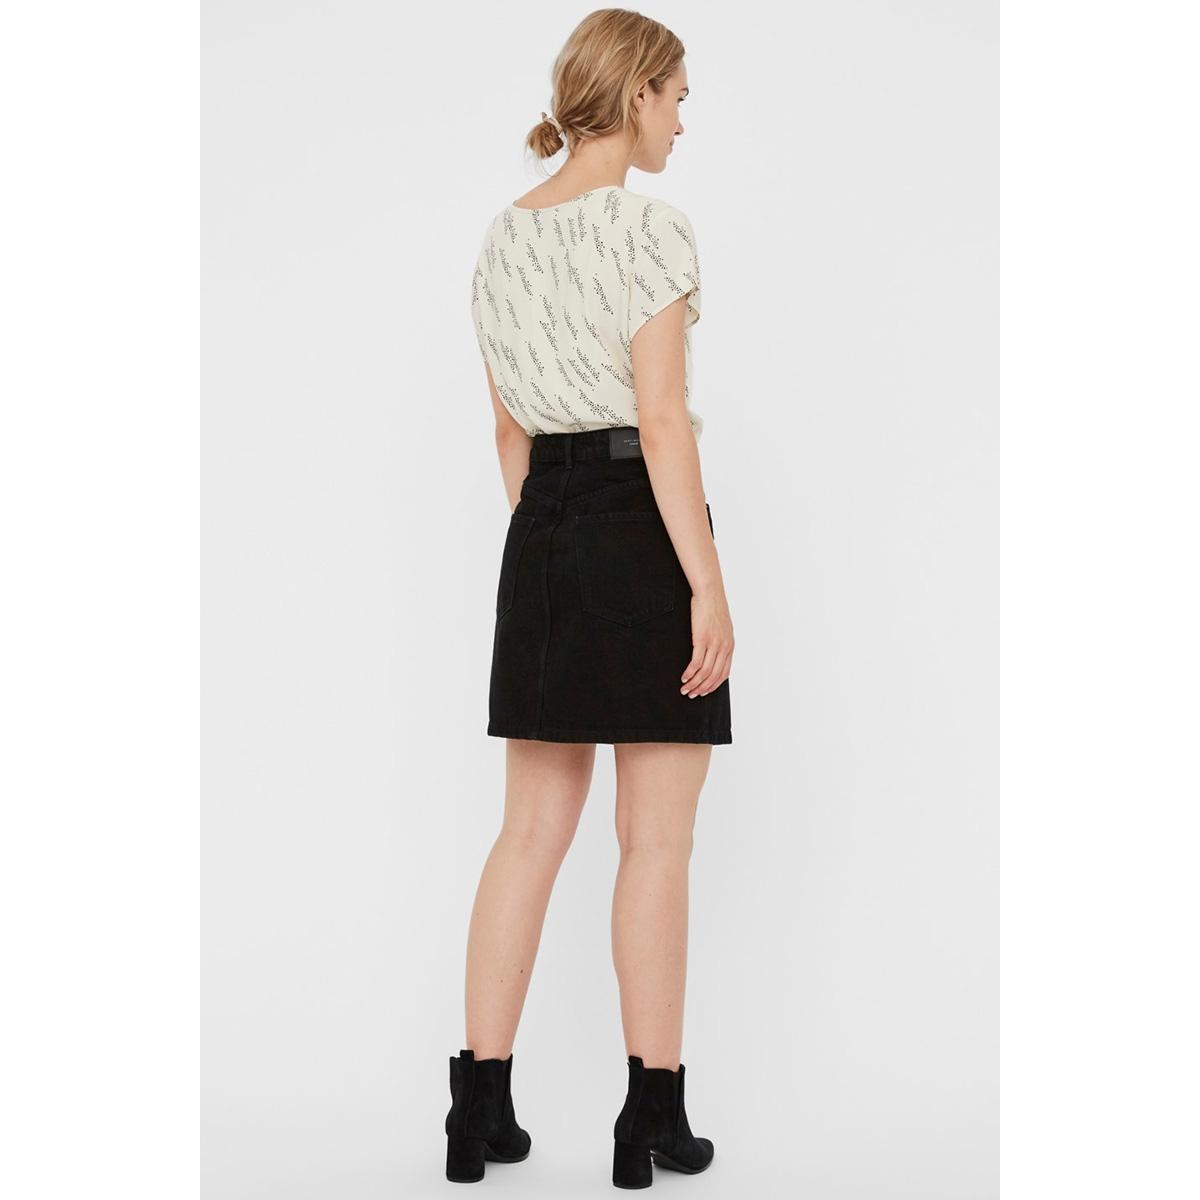 vmboca ss blouse multi aop 10132802 vero moda t-shirt birch/gunhild